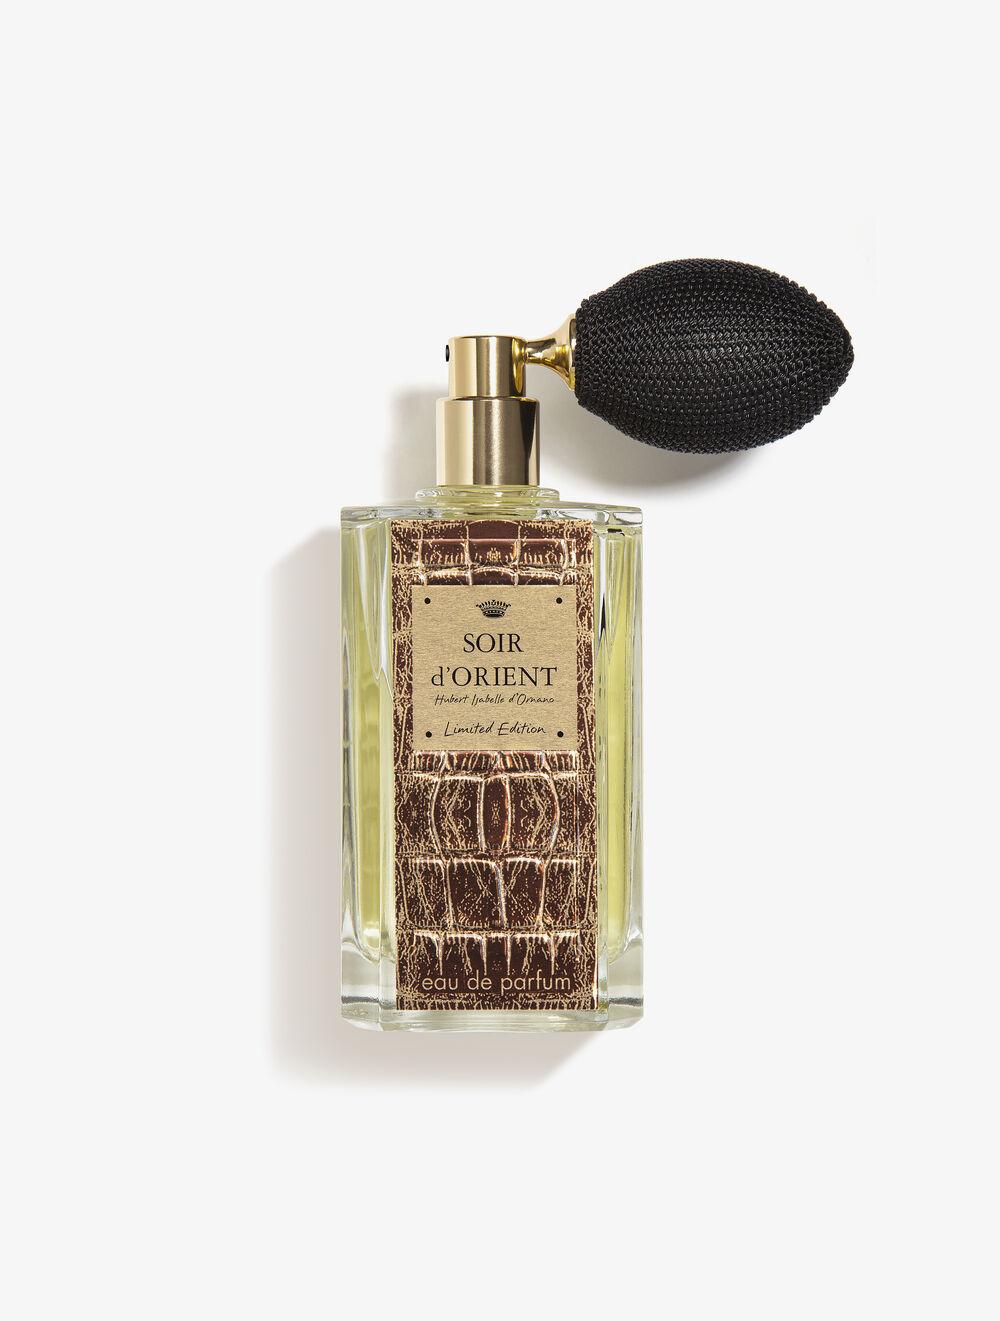 Soir d'Orient Wild Gold Edition 100 ml